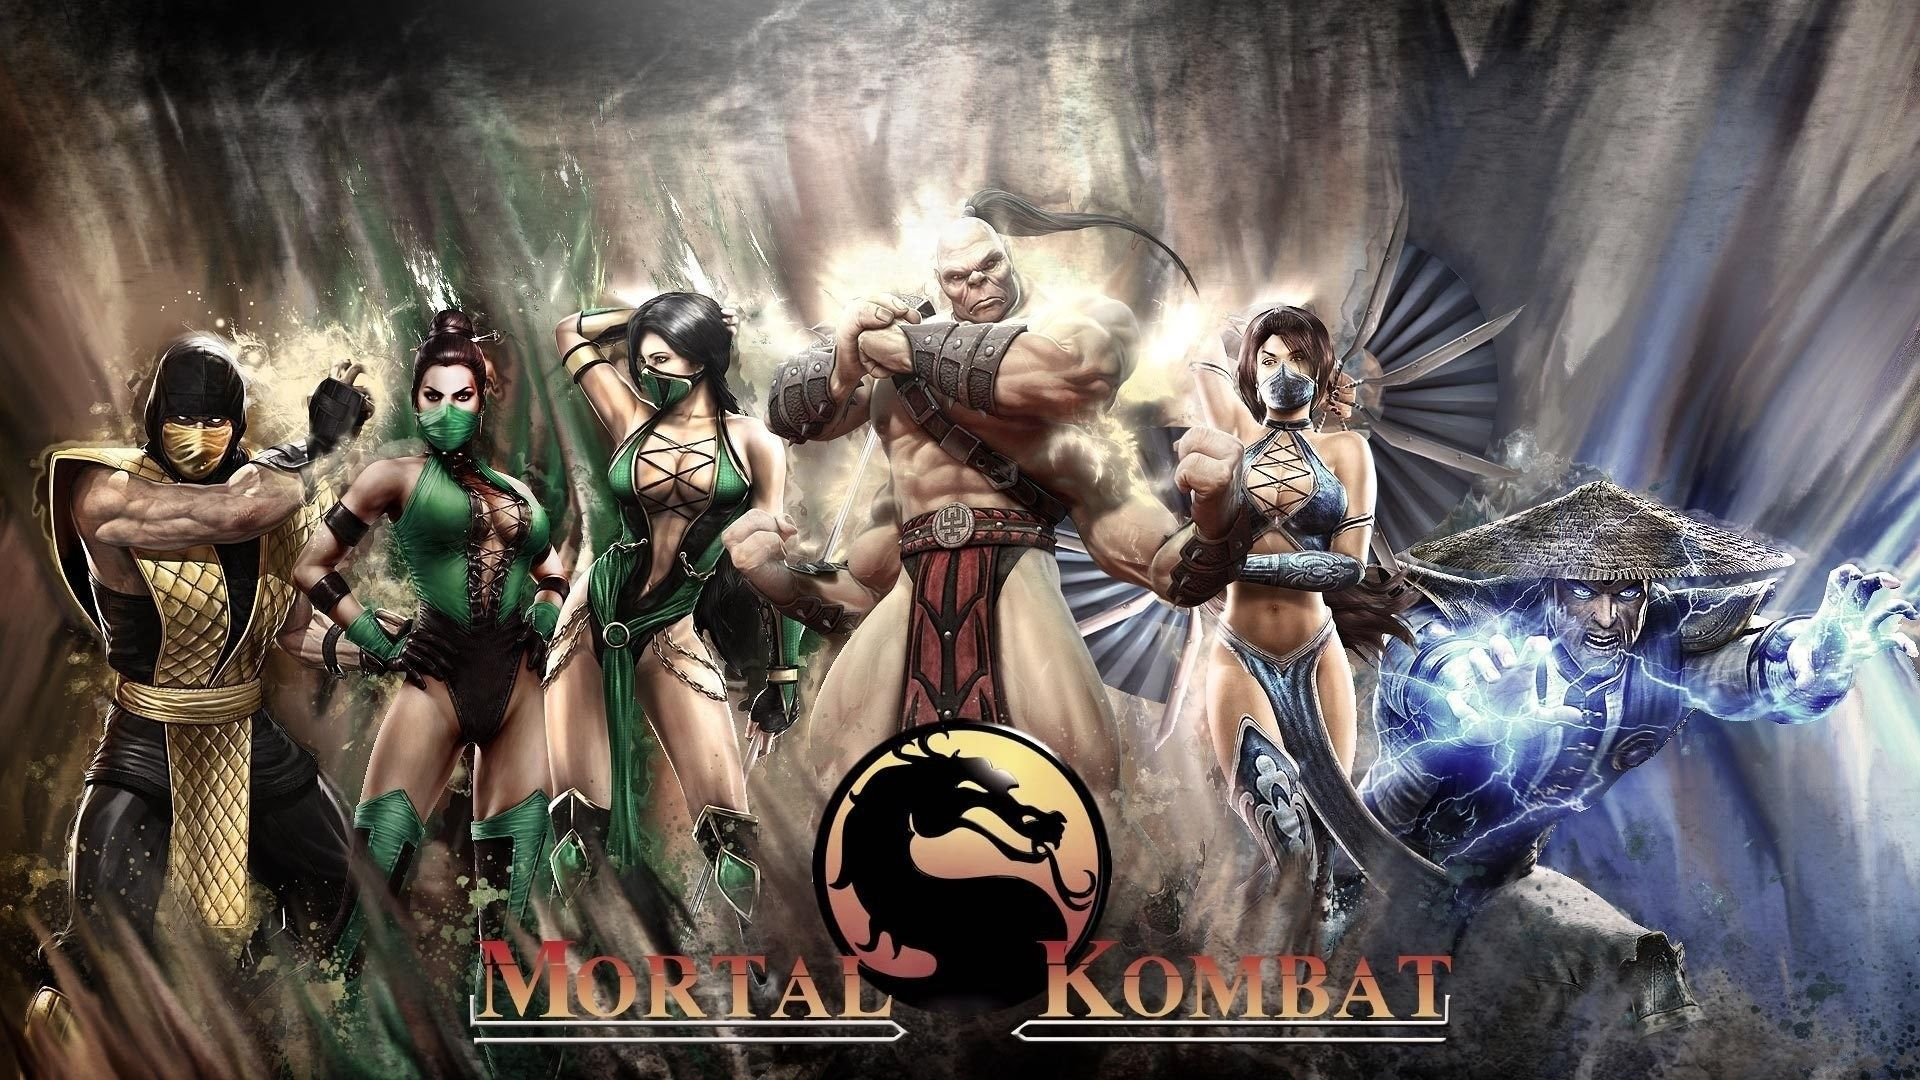 New Mortal Kombat Characters Name Game Faces Magic Wallpaper 1920x1080